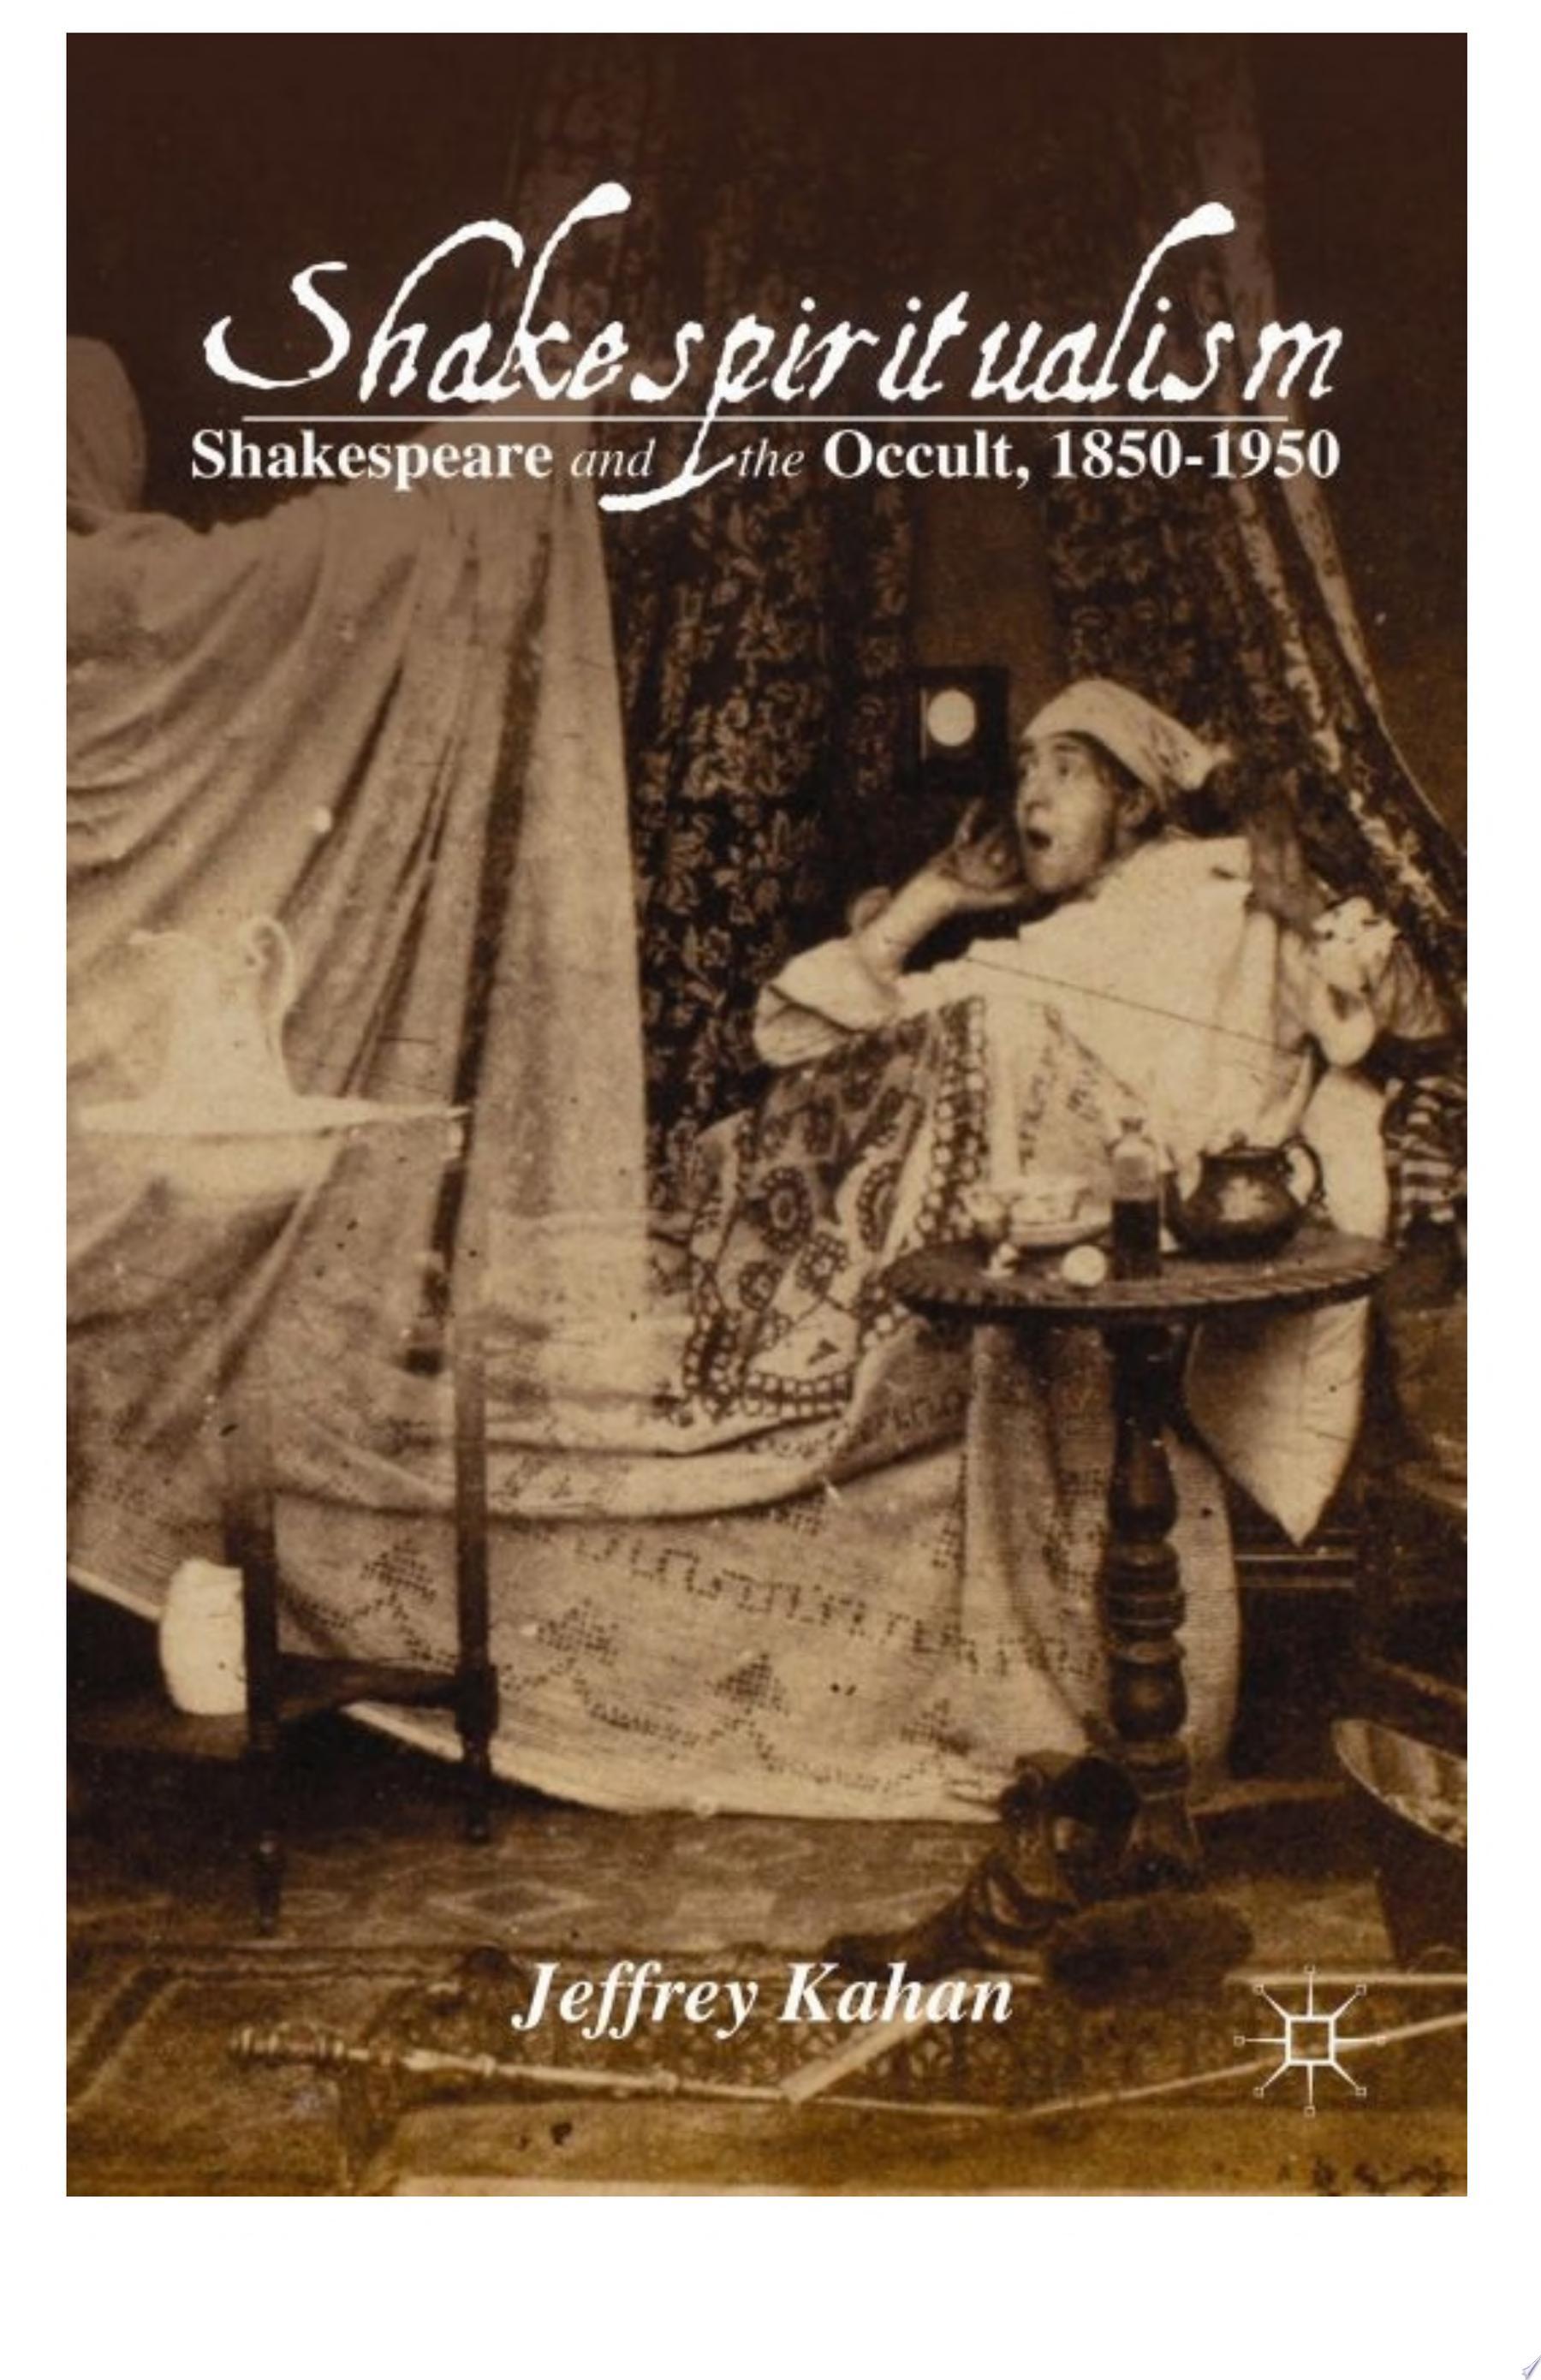 Shakespiritualism